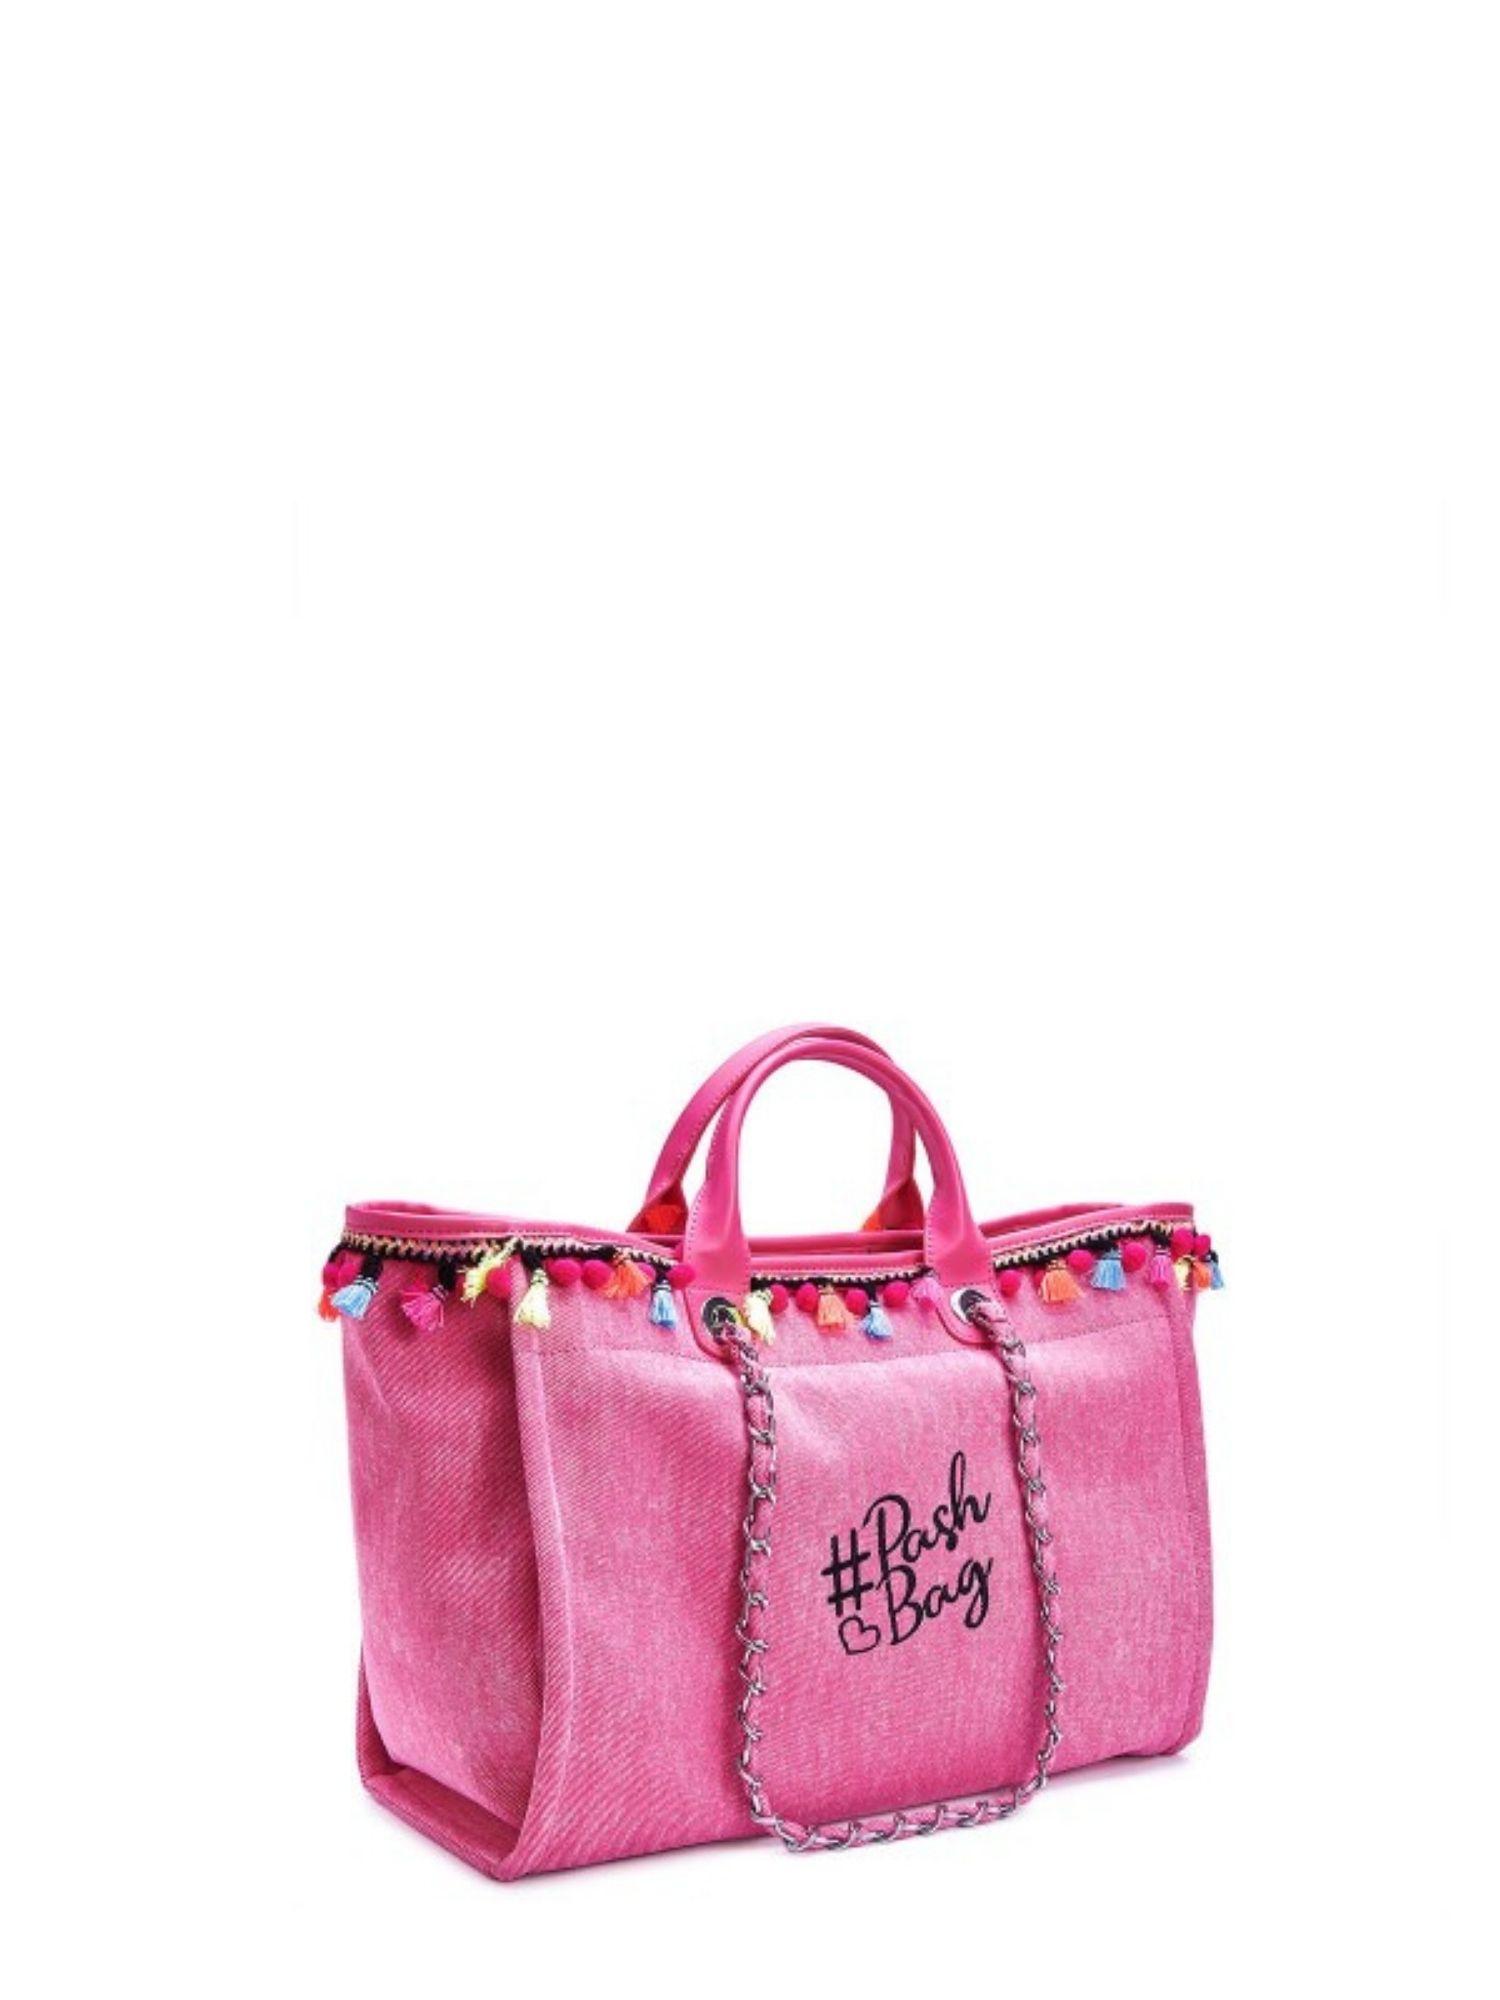 Borsa Atelier Du Sac Pash Bag 9801 Rosa 1